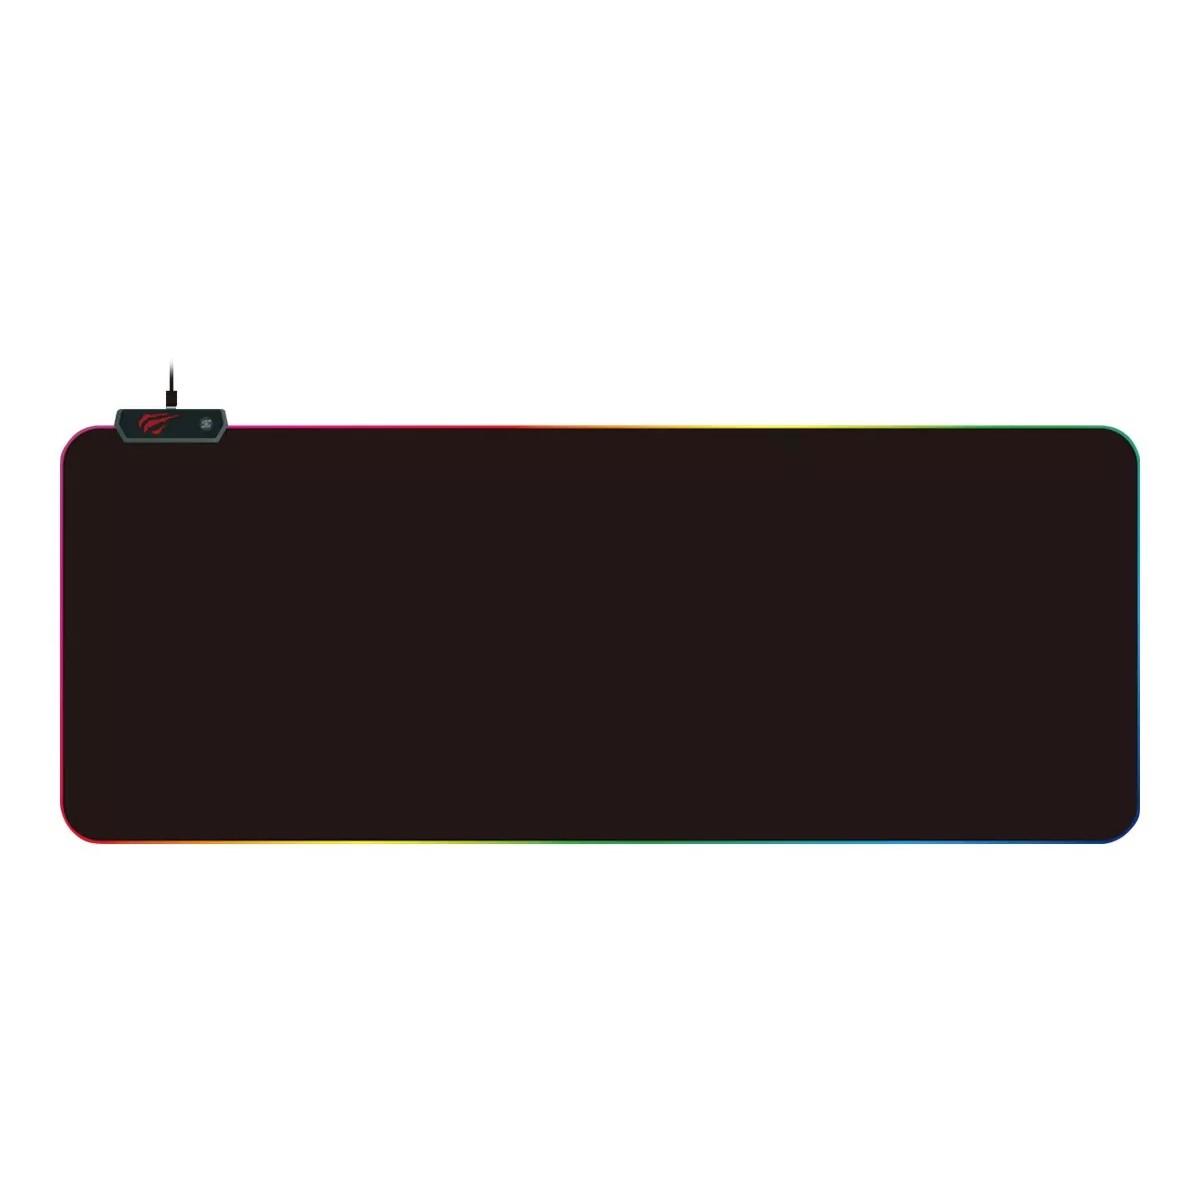 Mousepad Gamer Havit, MP905, RGB, XL, Black, HV-MP905 RGB